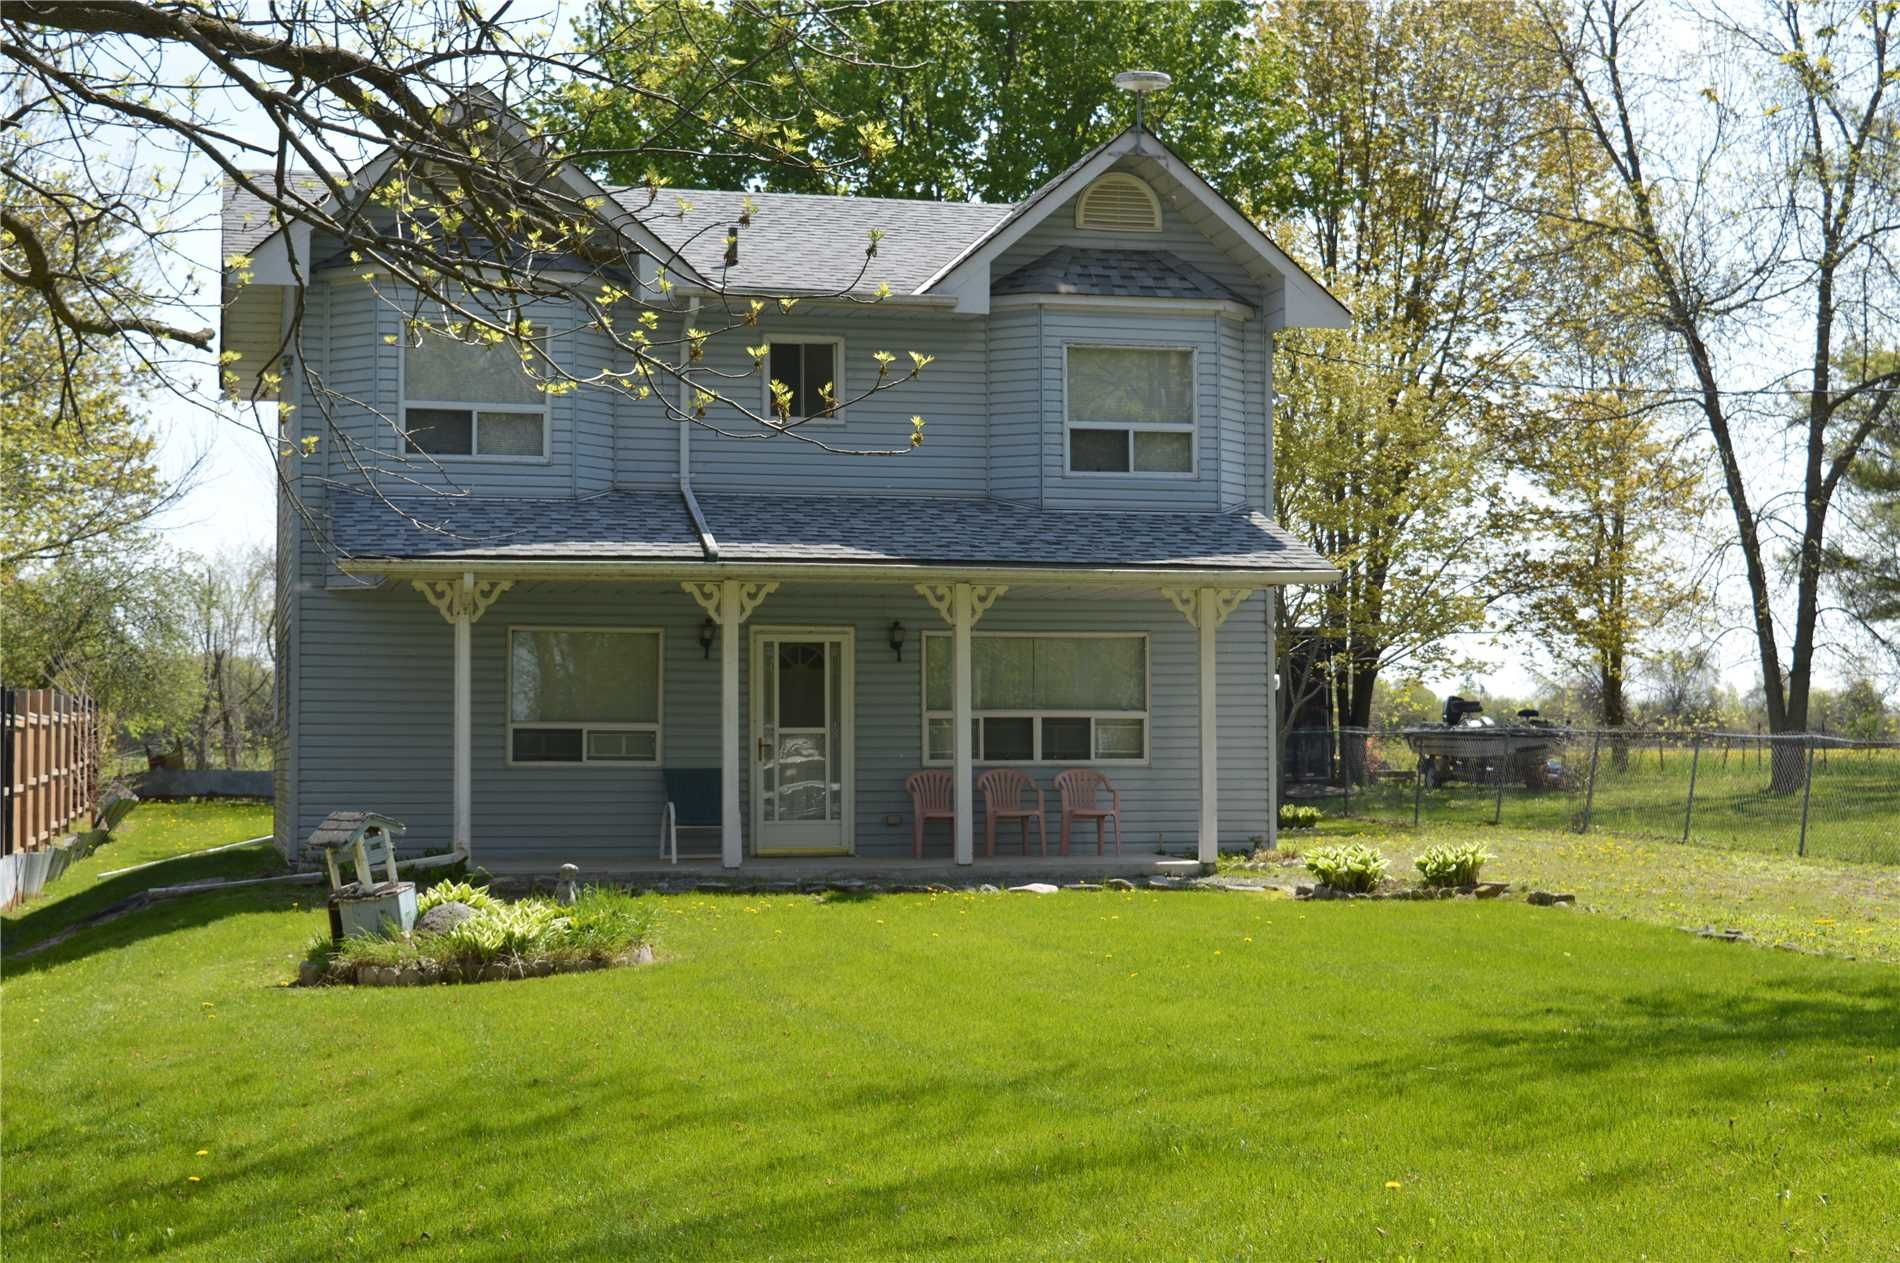 Main Photo: 2519 Lakeshore Drive in Ramara: Brechin House (2-Storey) for sale : MLS®# S4463780